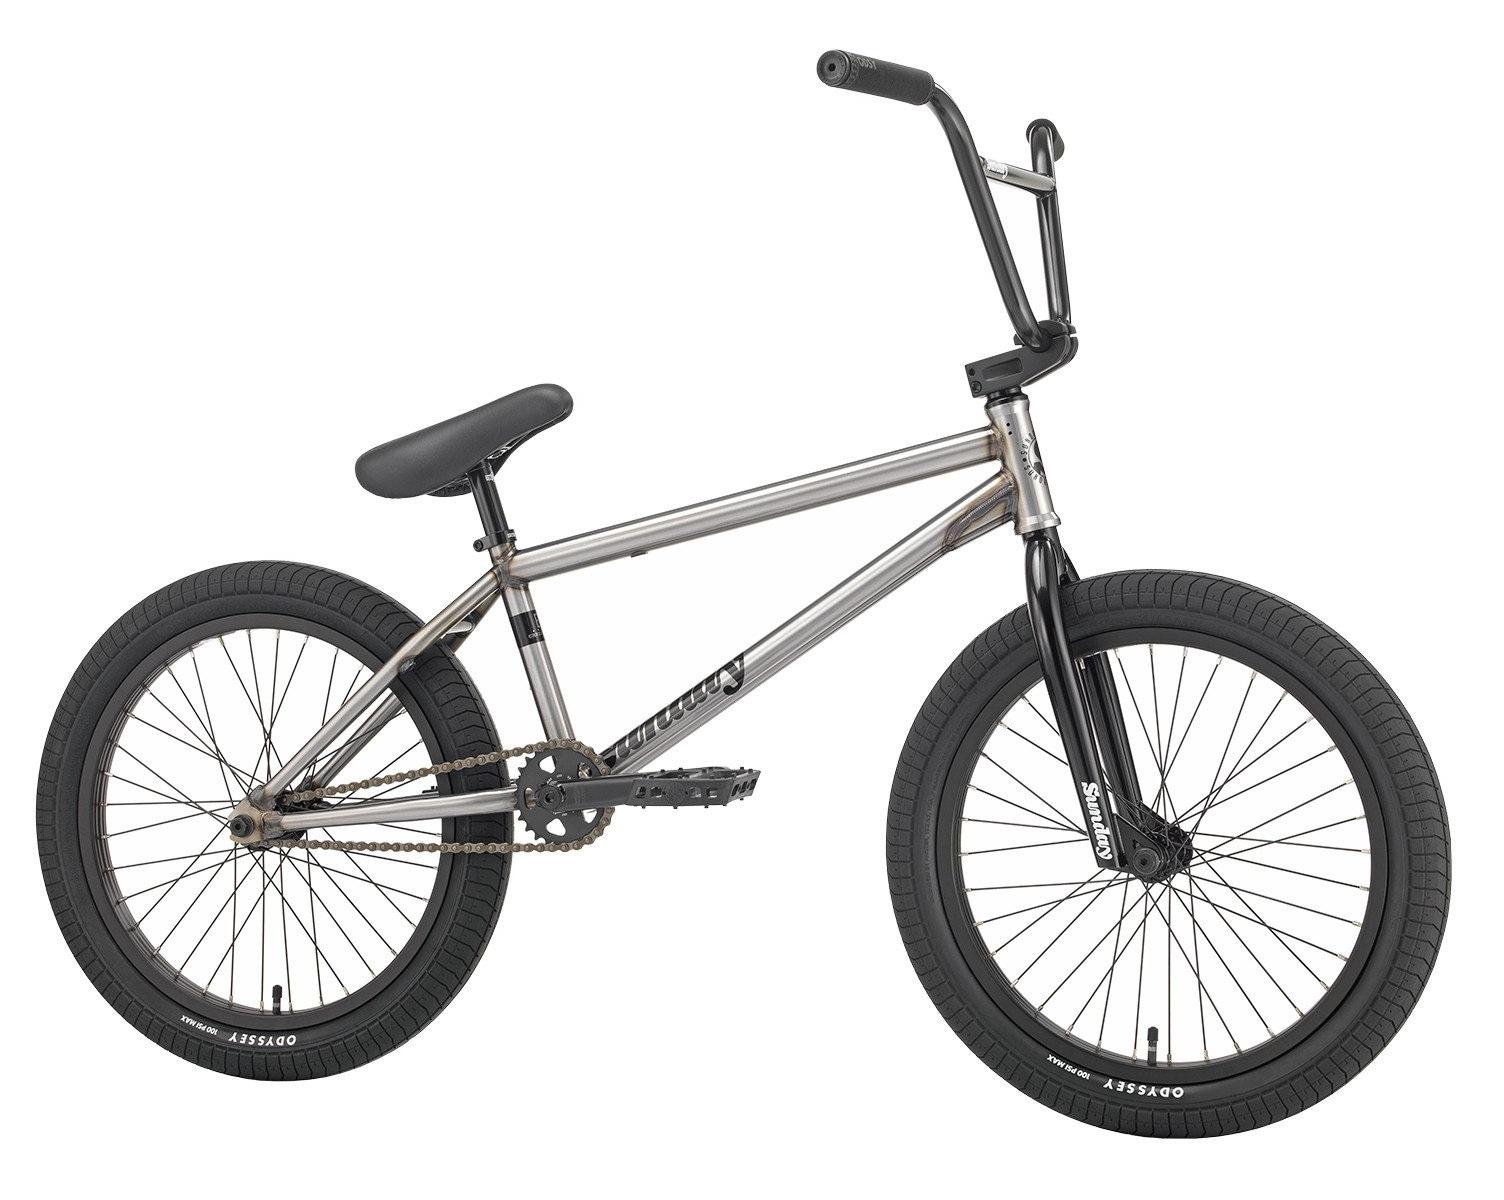 Bicicleta SUNDAY Ex 2018 $1'680.000